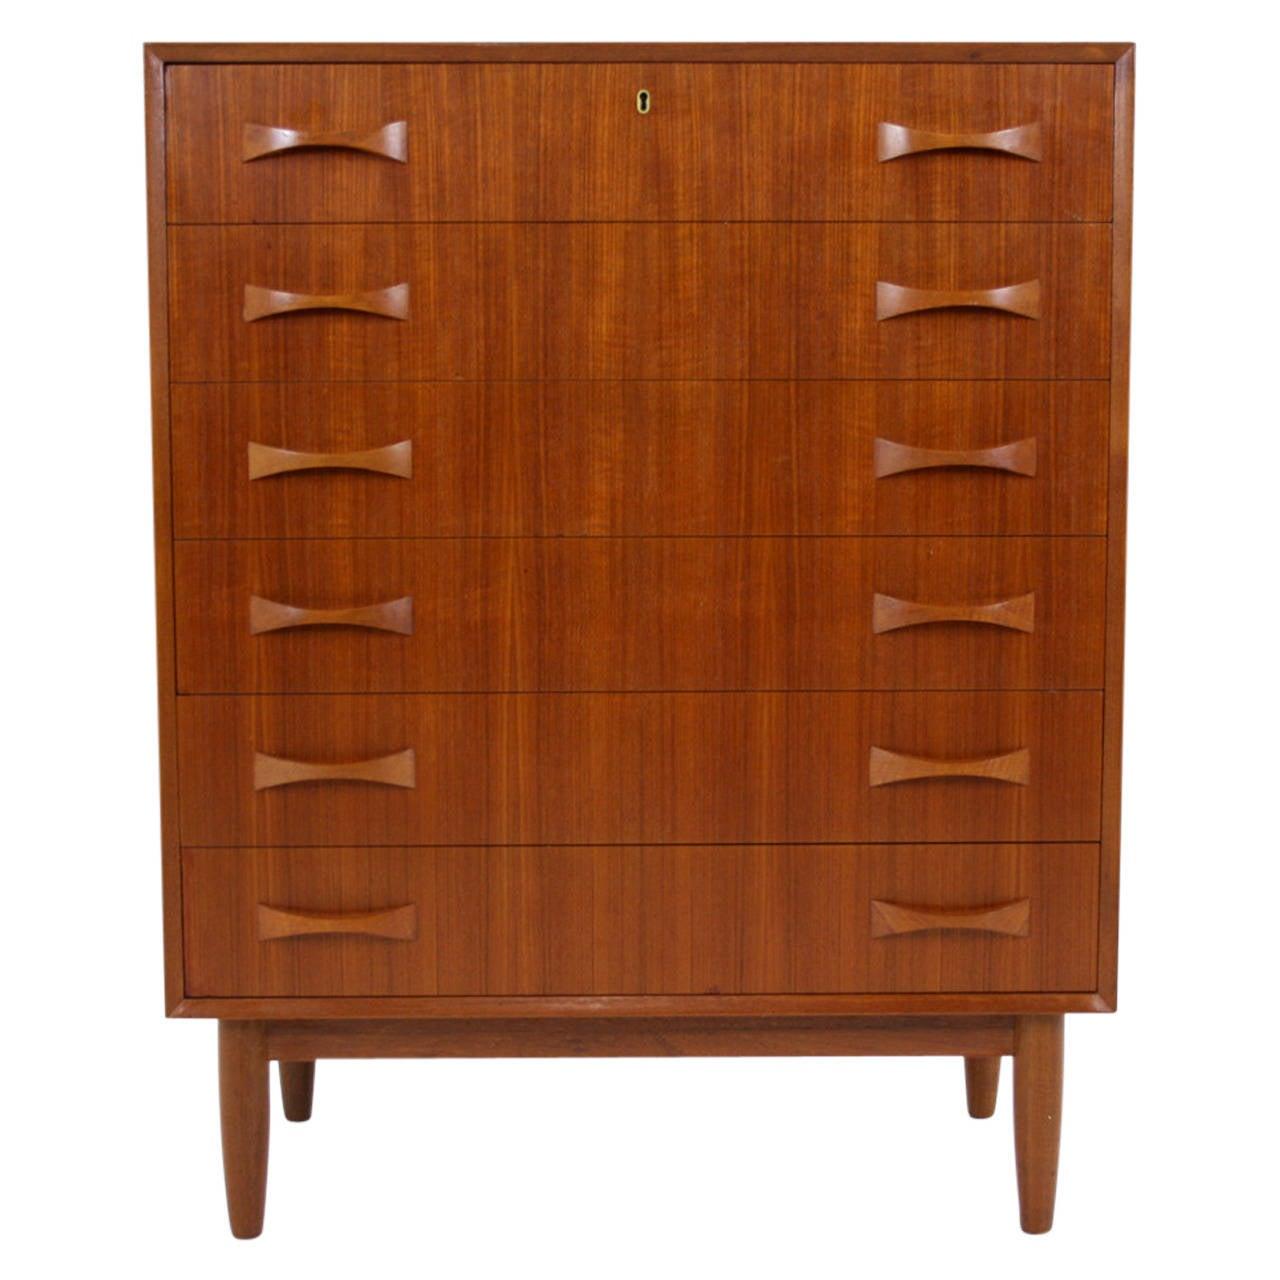 danish mid century modern 1960s six drawer teak dresser or chest of drawers at 1stdibs. Black Bedroom Furniture Sets. Home Design Ideas